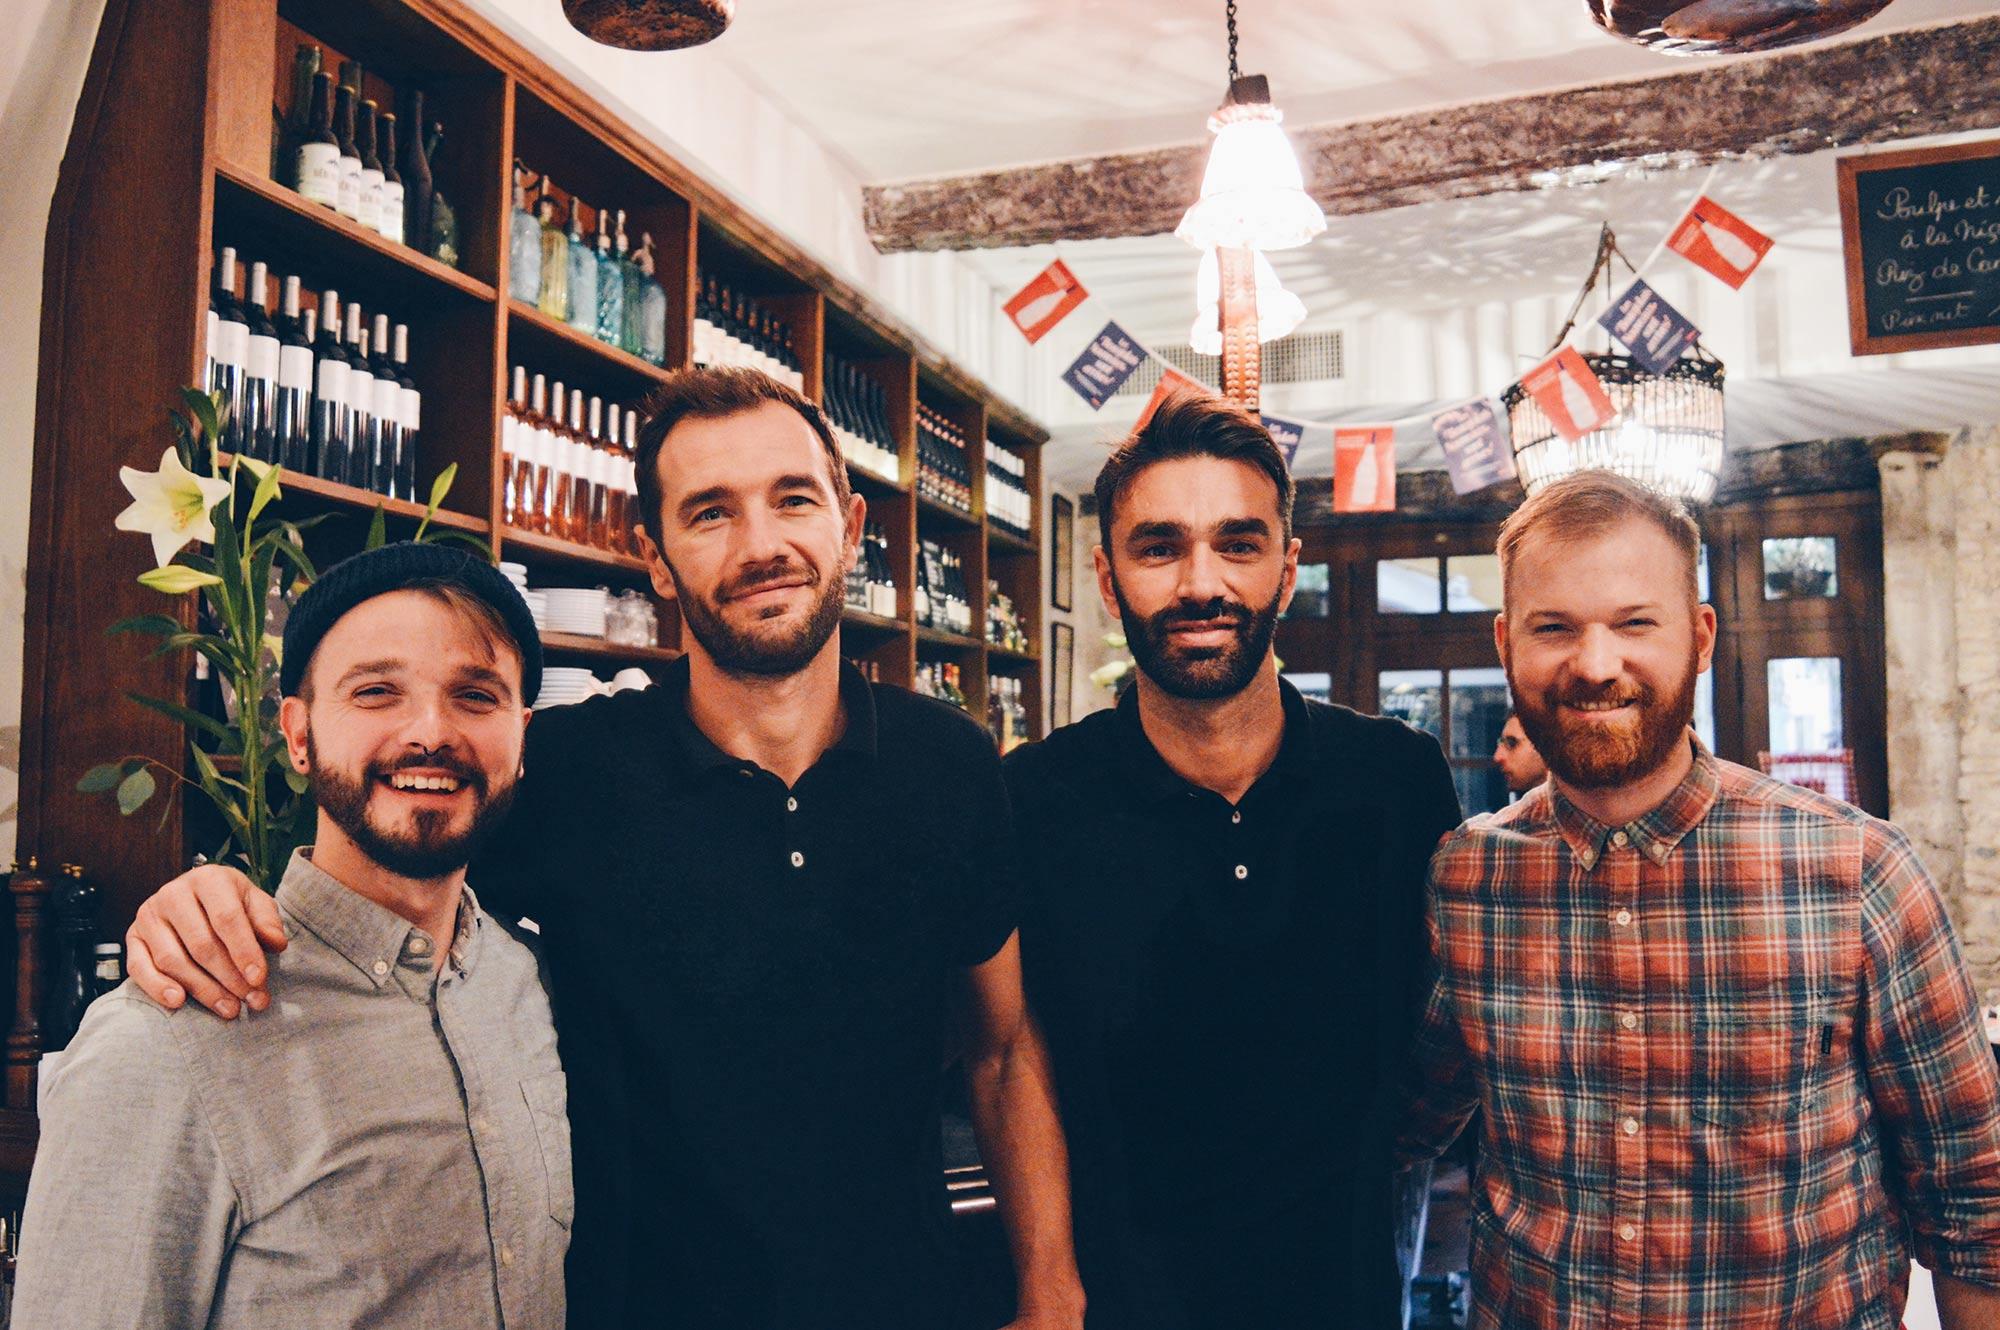 Italian Restaurant Chez Acchiardo Nice France 4 handsome sexy gay guys in Nice France